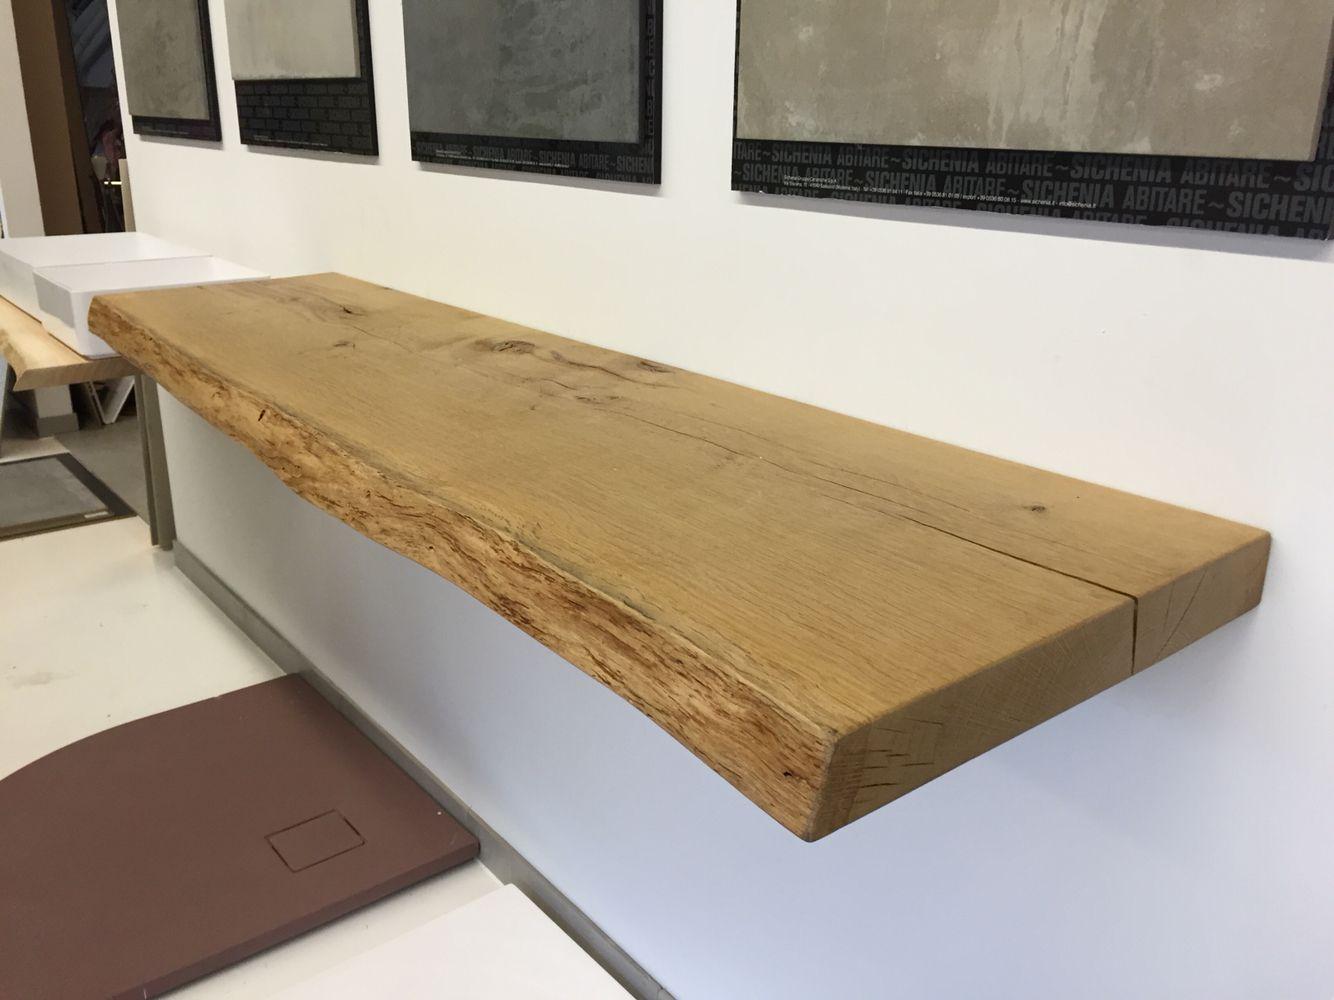 Eiche massiv Waschtischplatte nach Maß | Echtholz Waschtischplatten ...